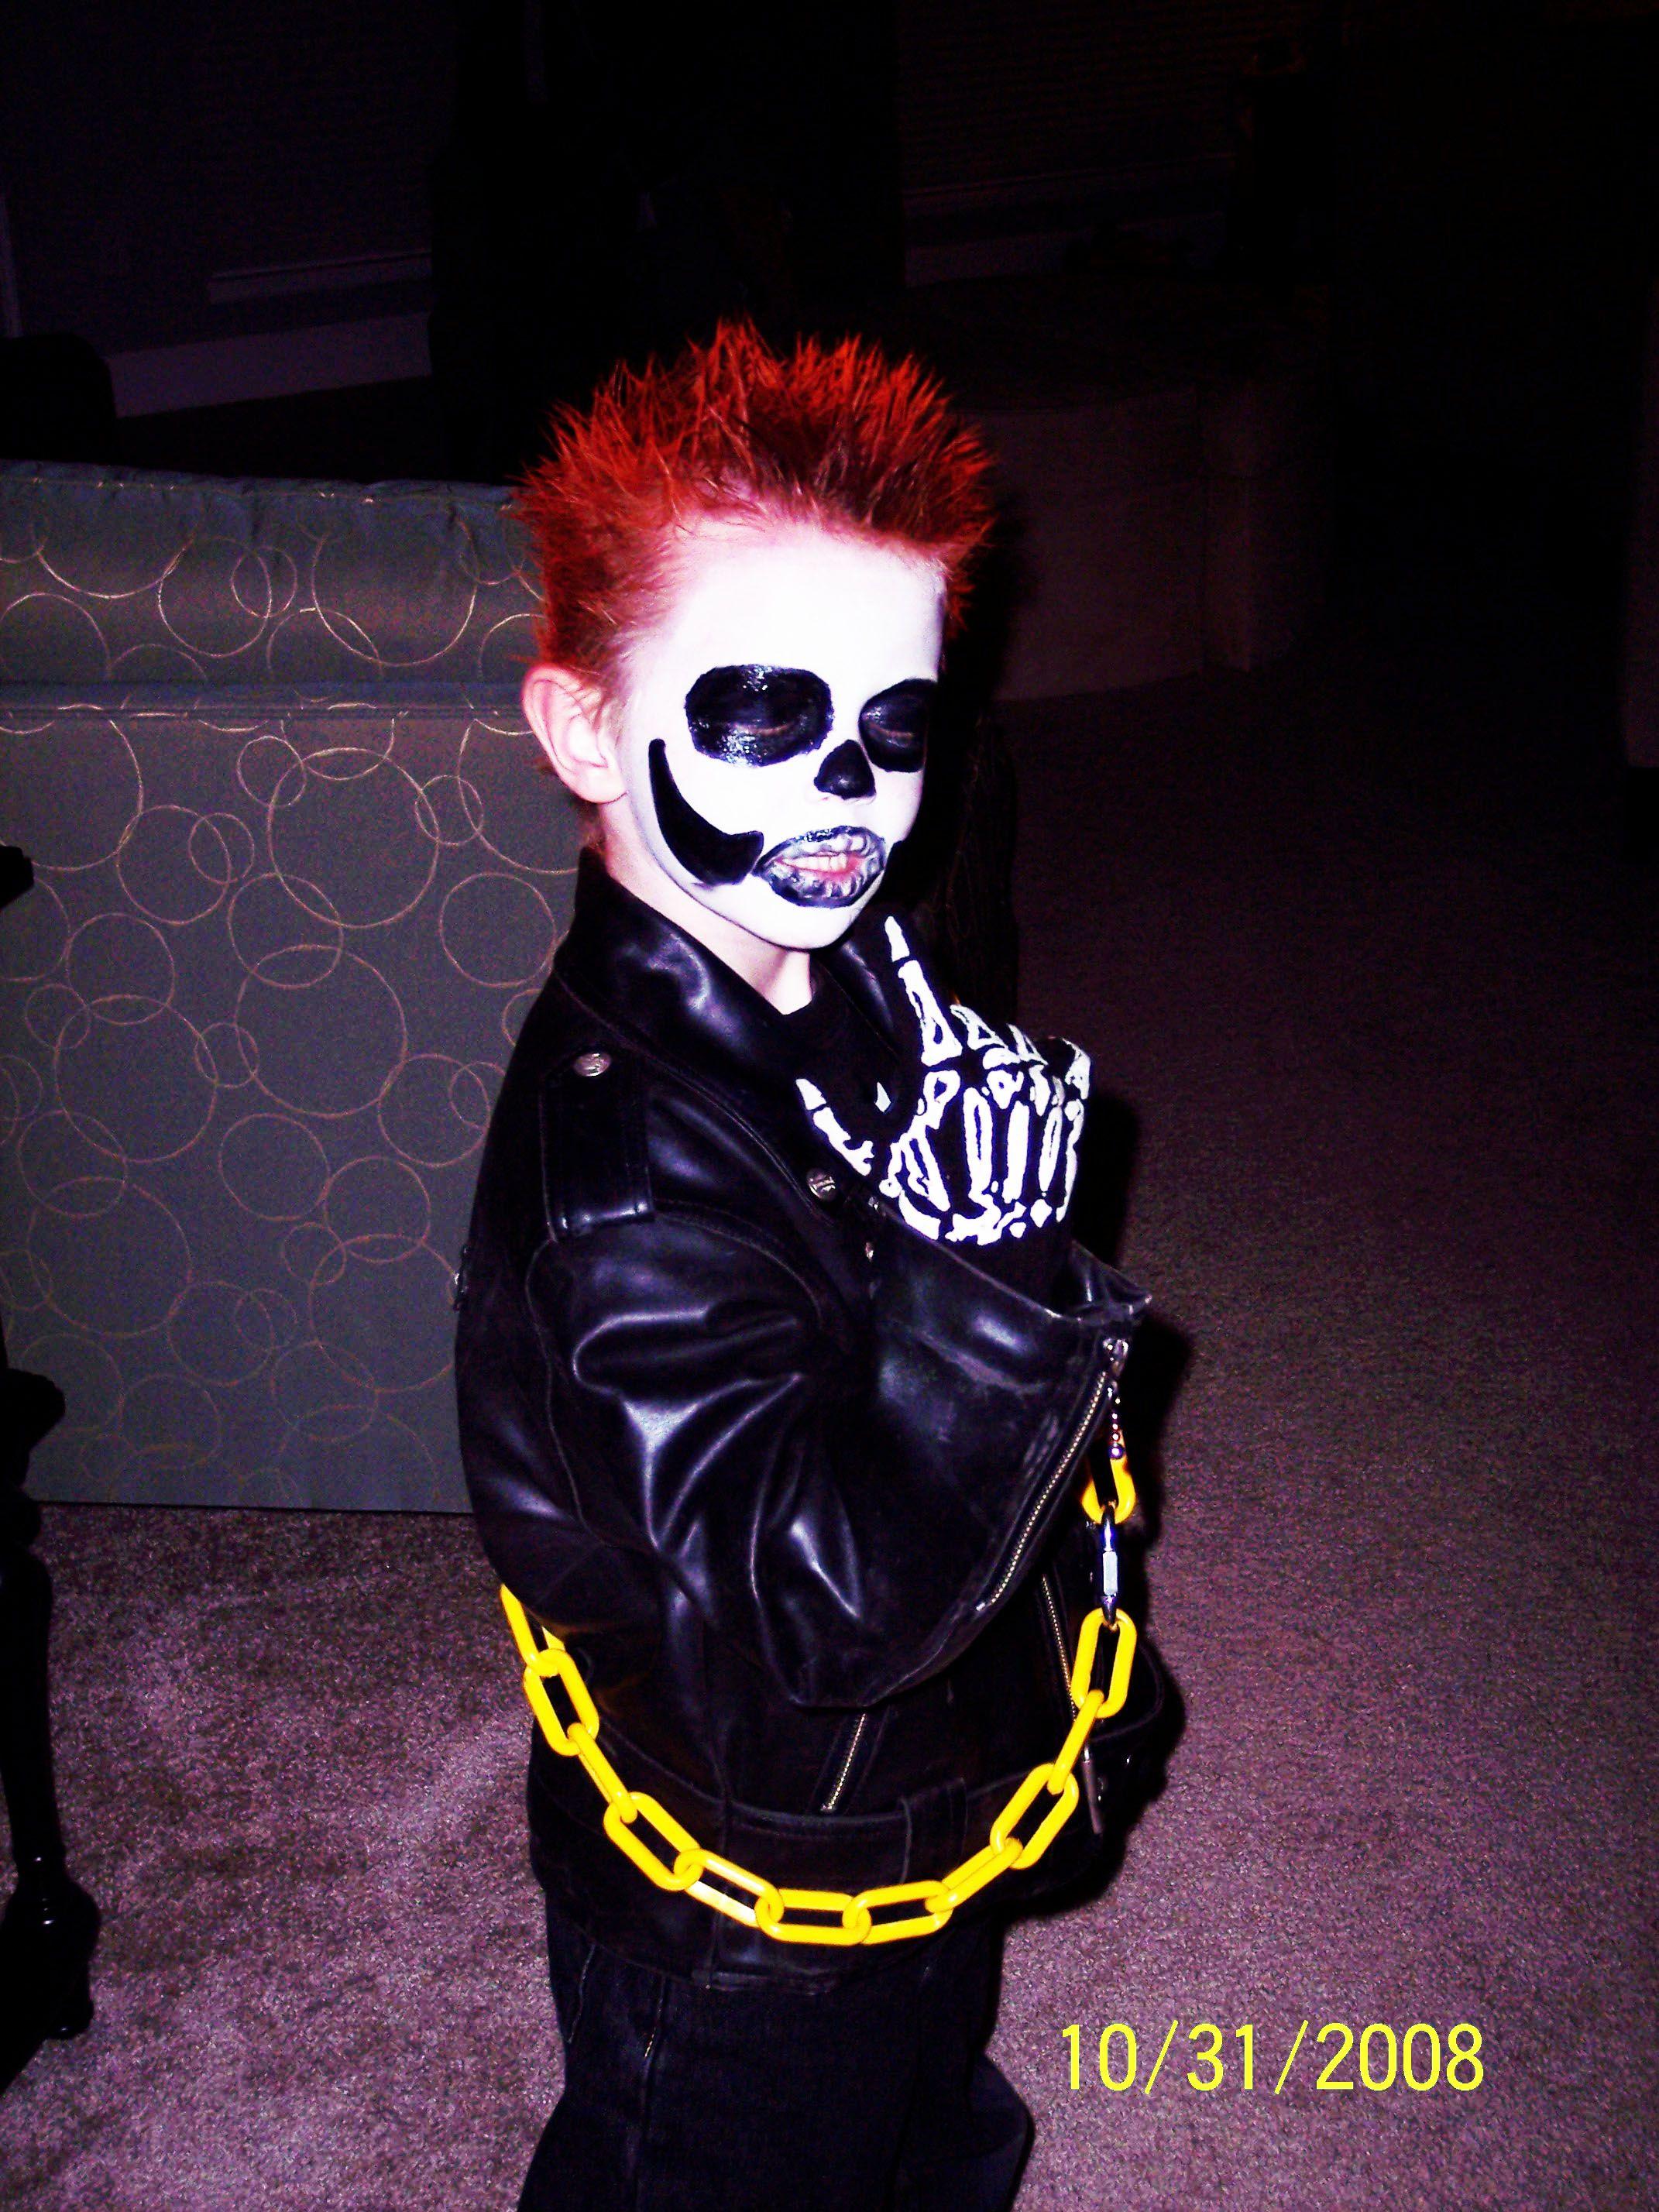 Ghost Rider DIY Costume - He loved it! | Halloween | Pinterest ...